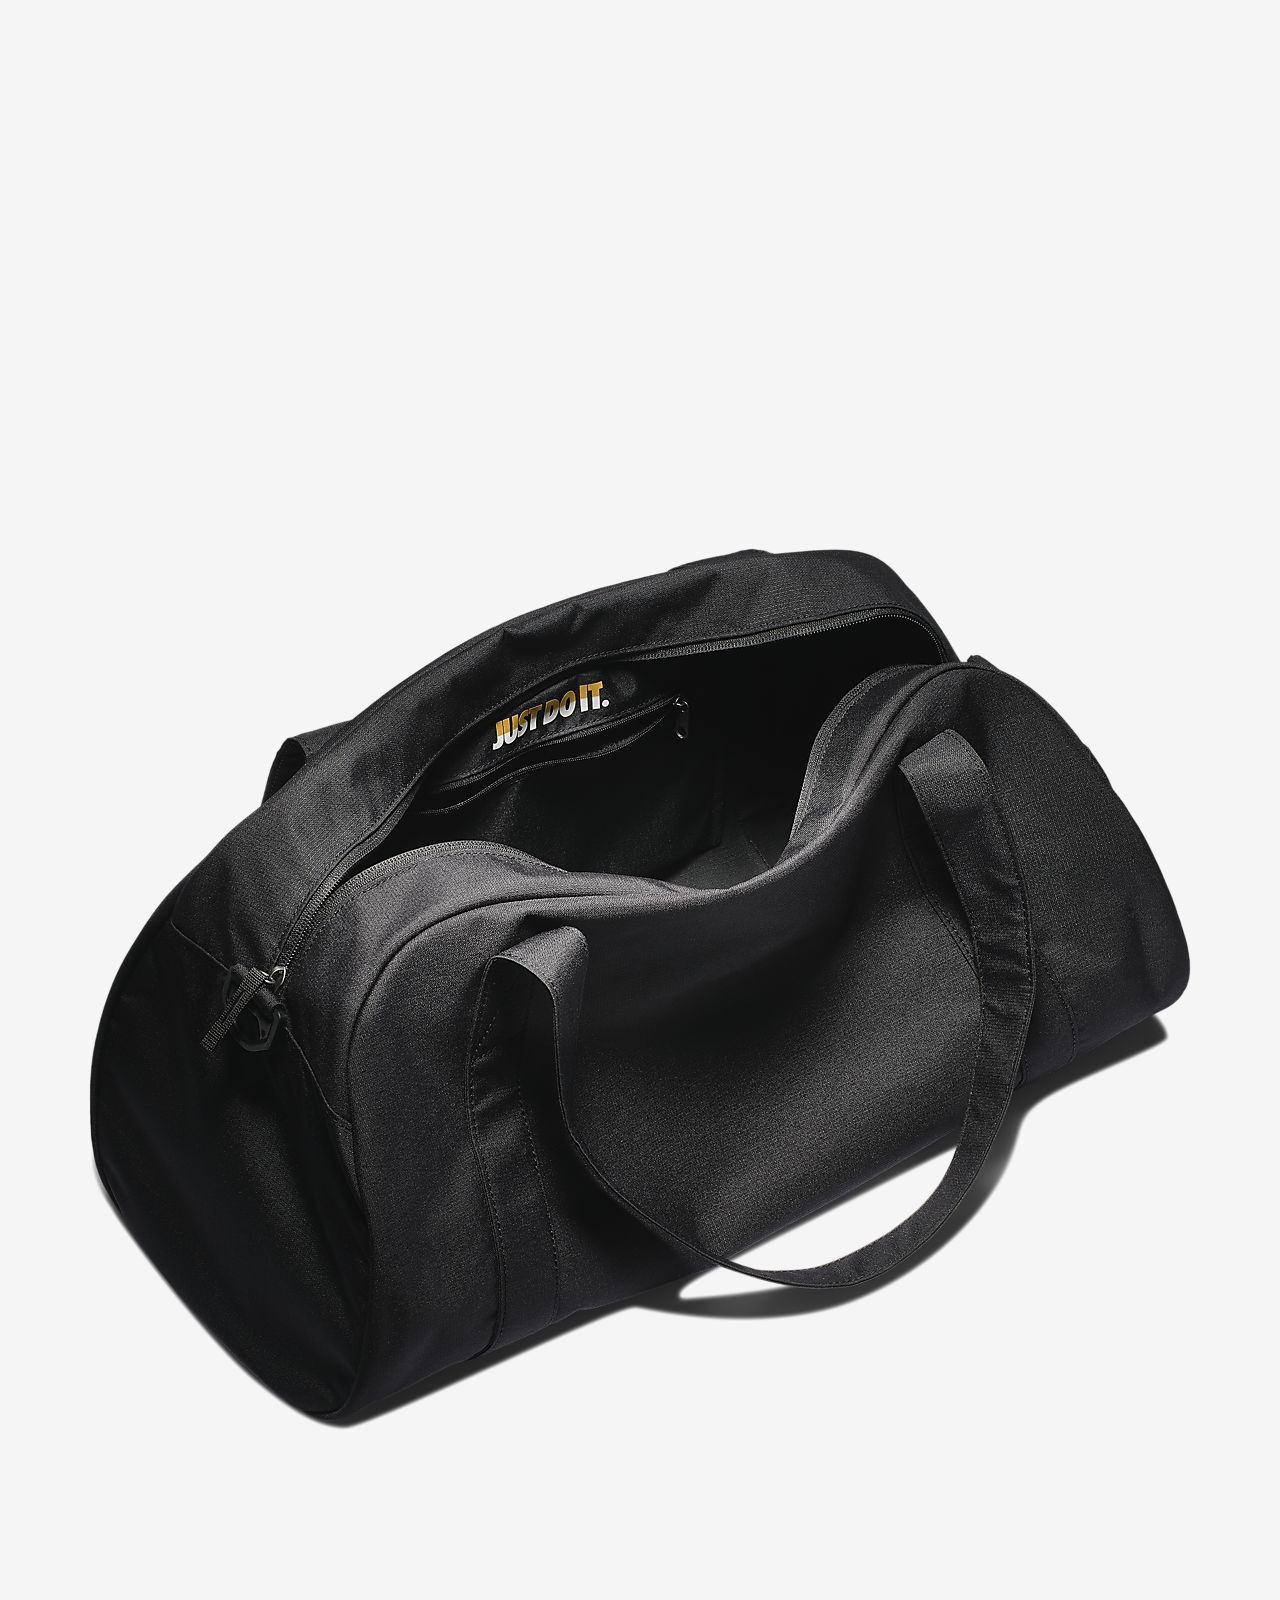 f1f5d6126d Γυναικεία τσάντα γυμναστηρίου για προπόνηση Nike Gym Club. Nike.com GR